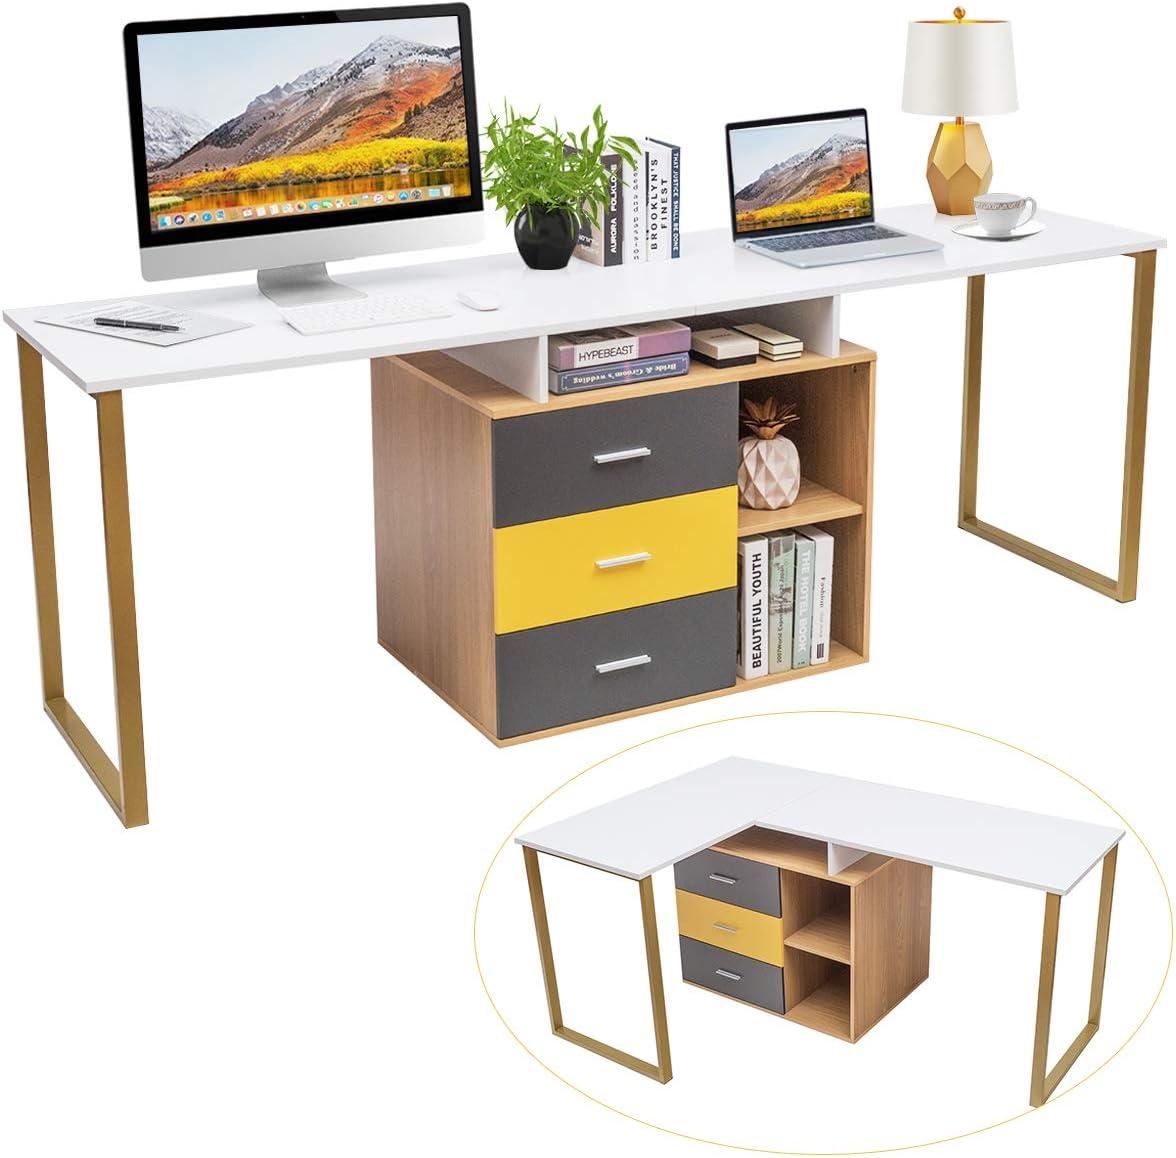 Tangkula 87 inch 2-Person Desk Double Computer Desk